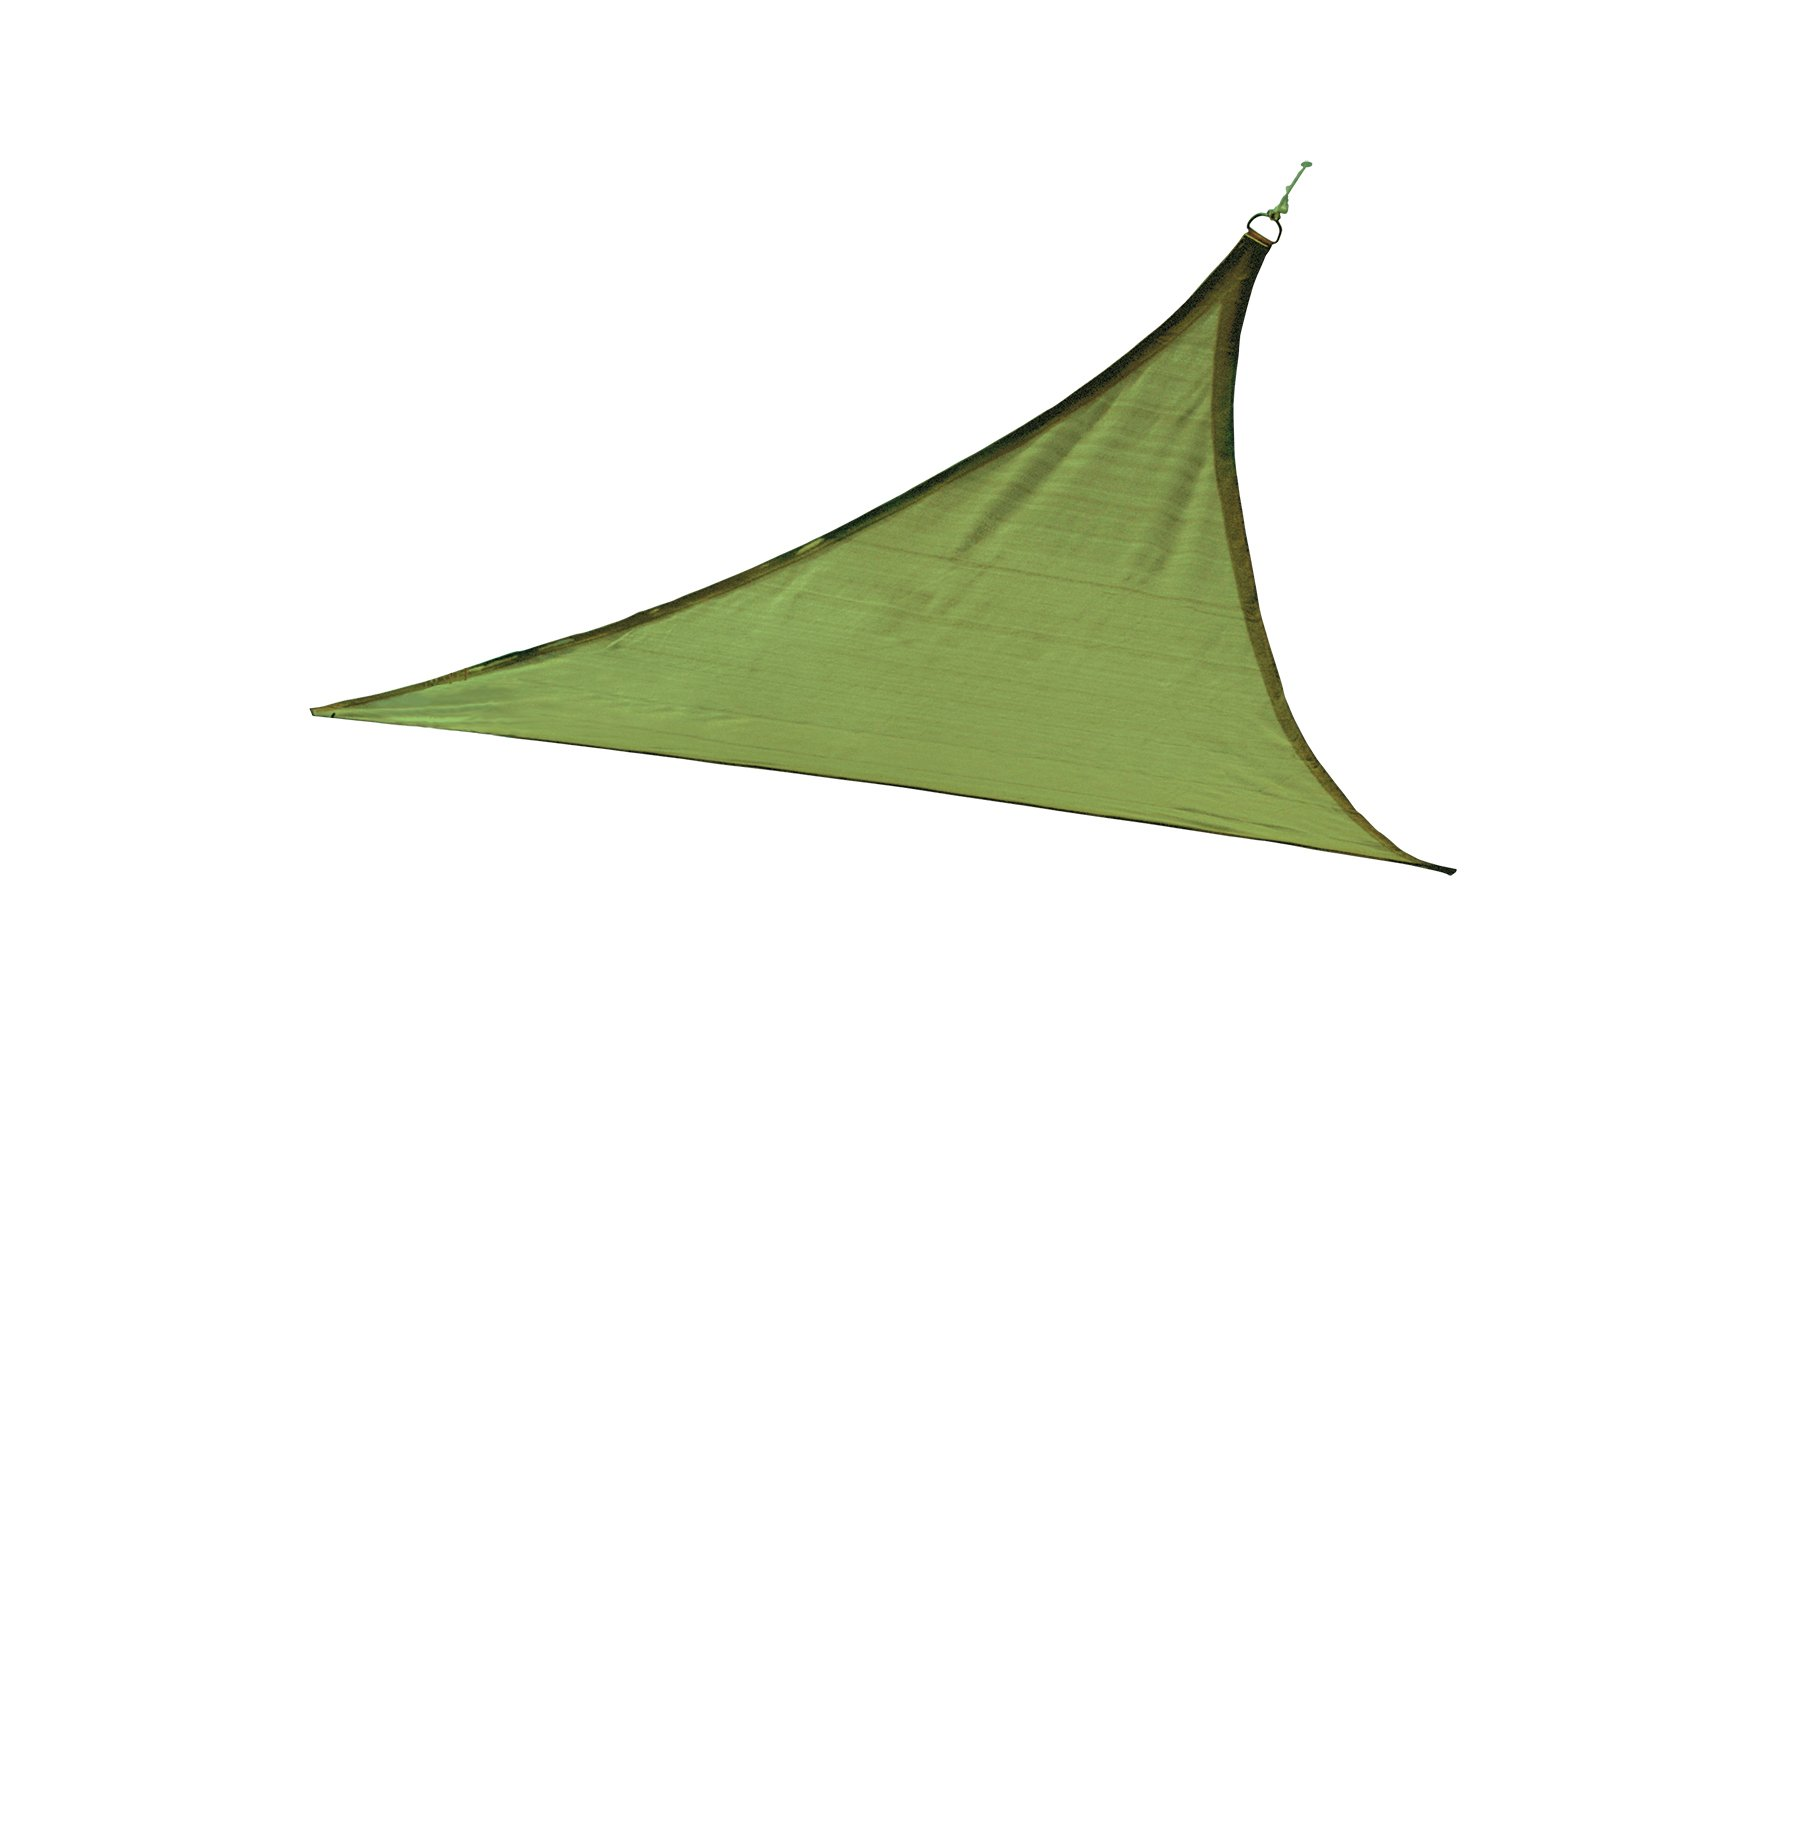 ShelterLogic Triangle Shade Sail, Lime Green, 12 x 12 x 12 ft.